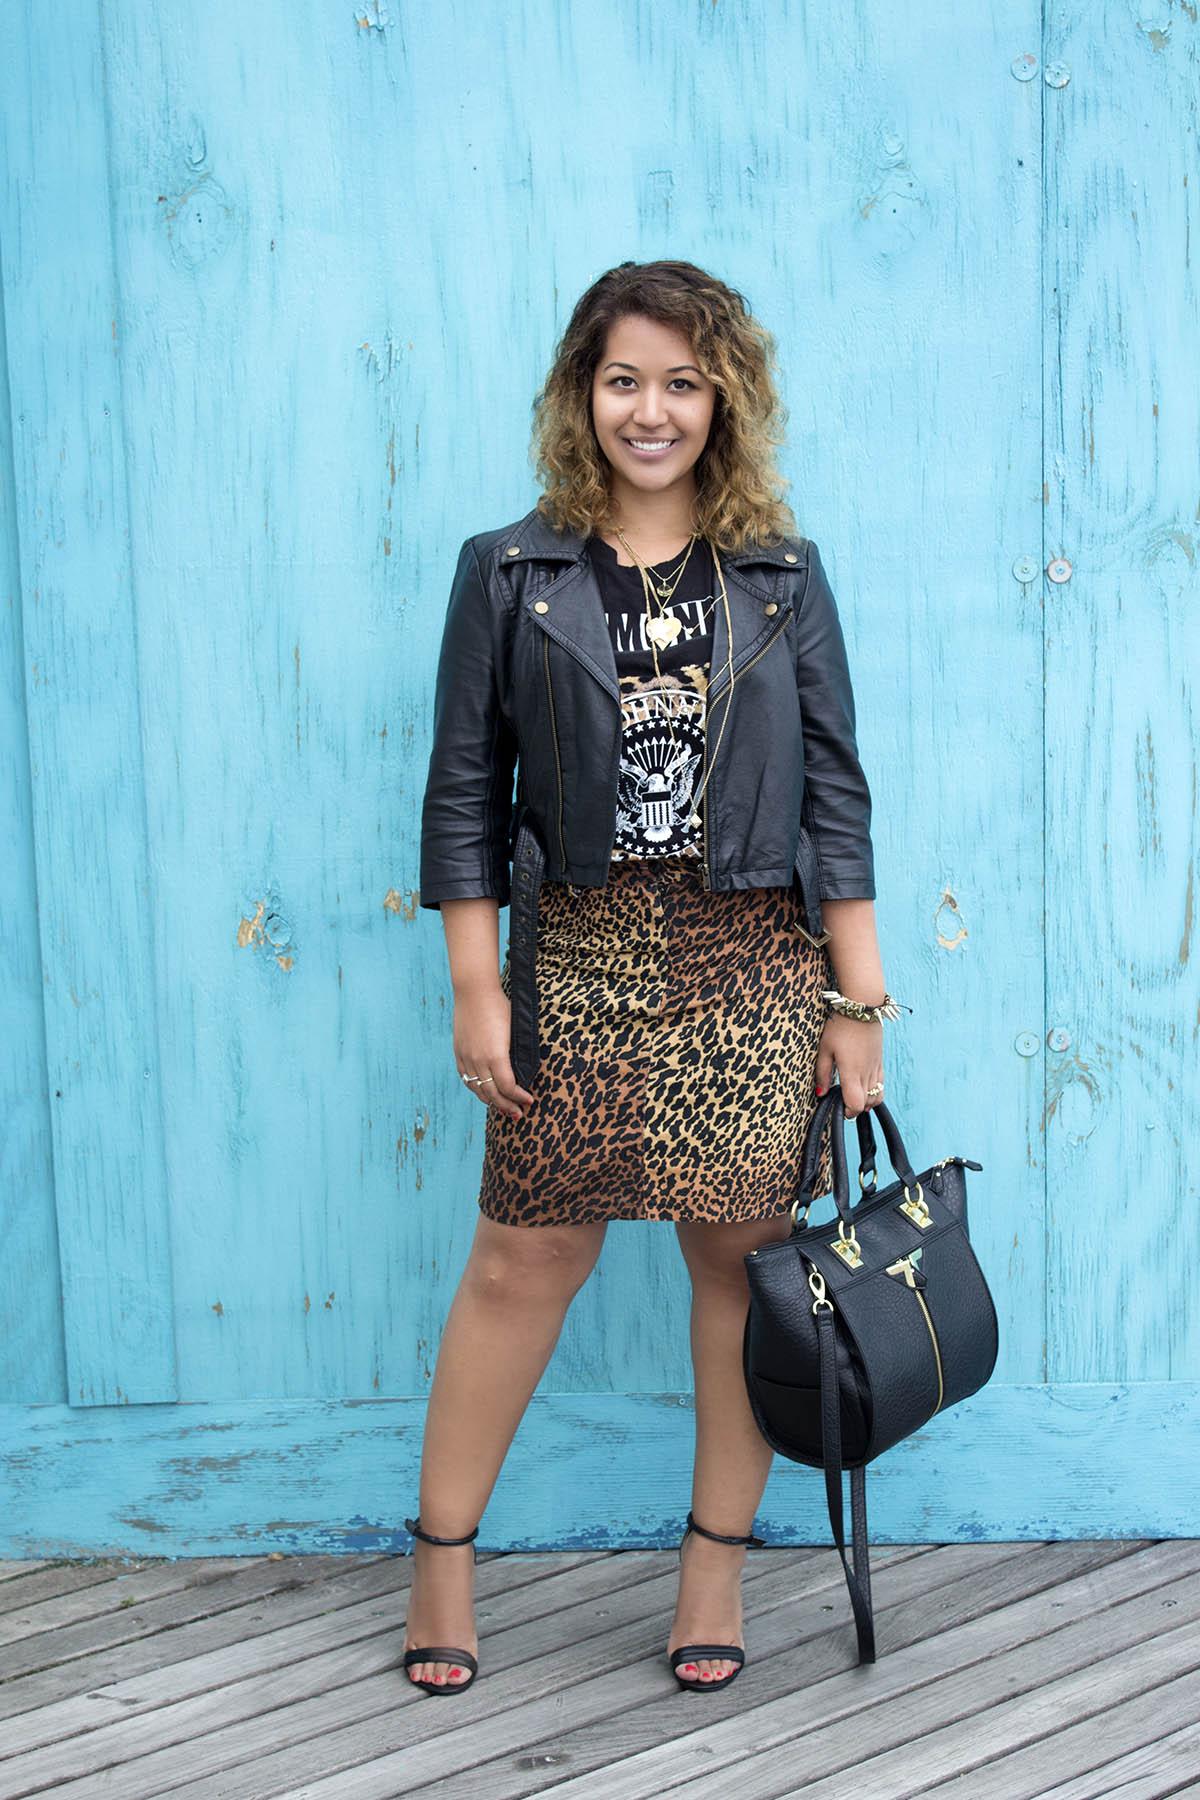 Cheetah Print Summer Look www.krityshrestha.com